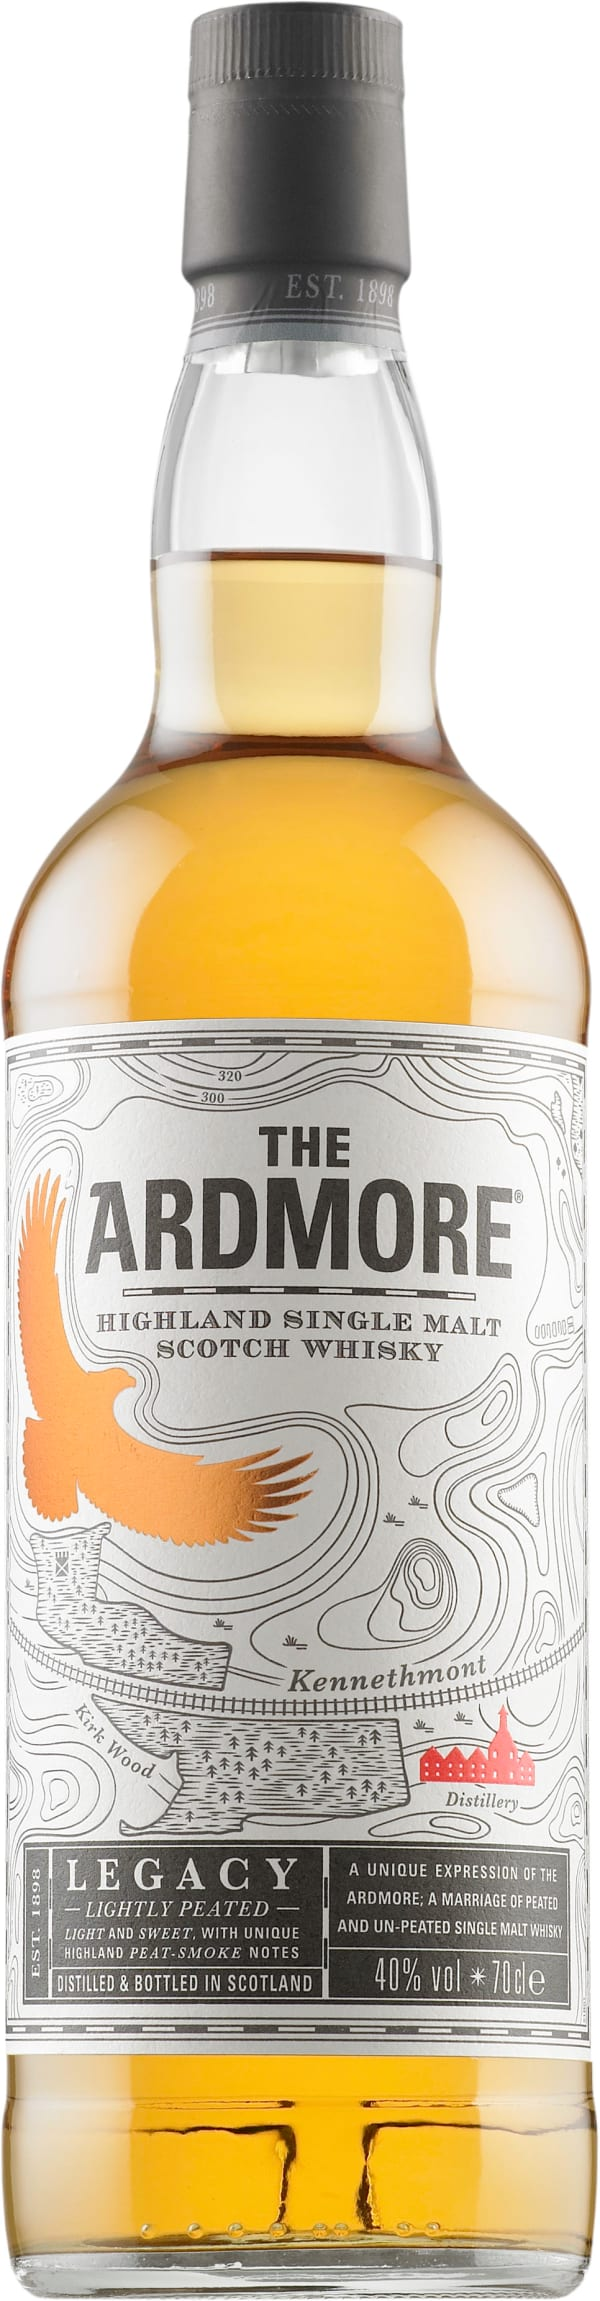 The Ardmore Legacy Single Malt